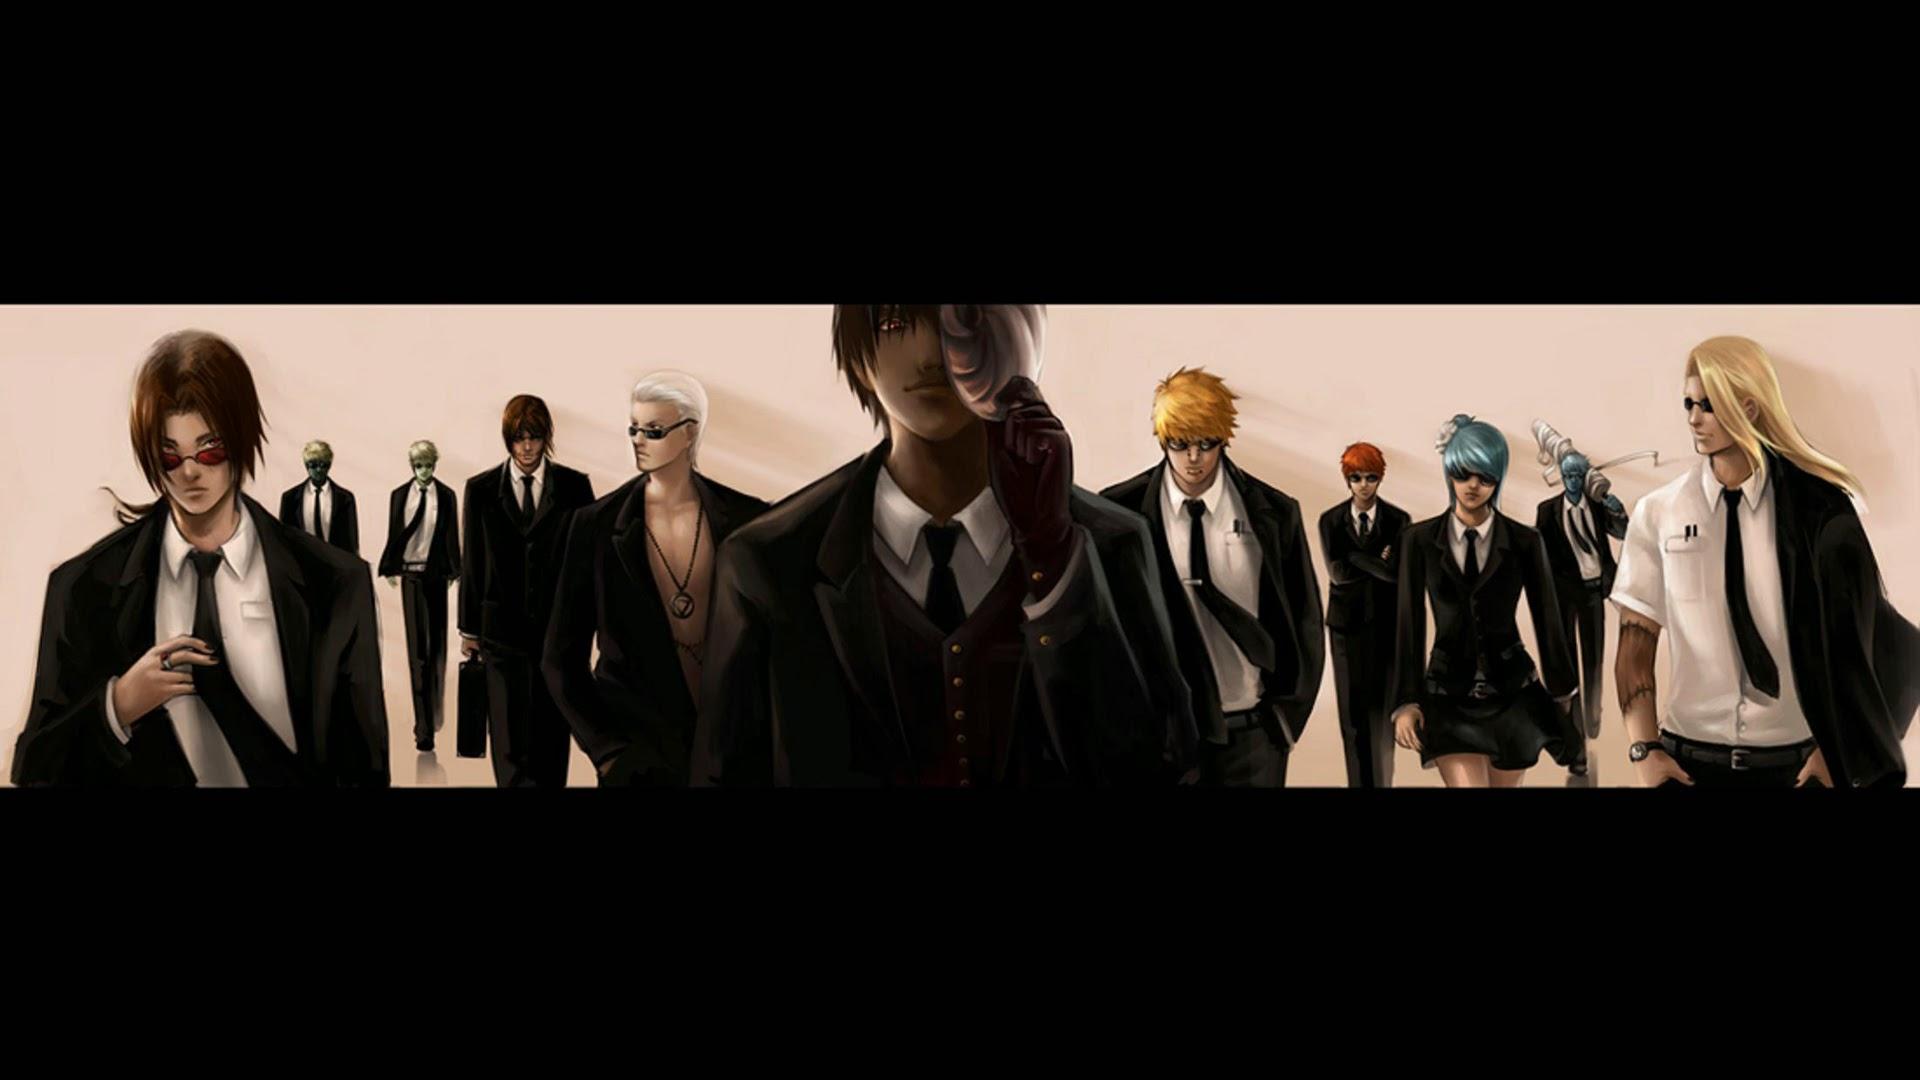 akatsuki member anime picture 0t wallpaper hd